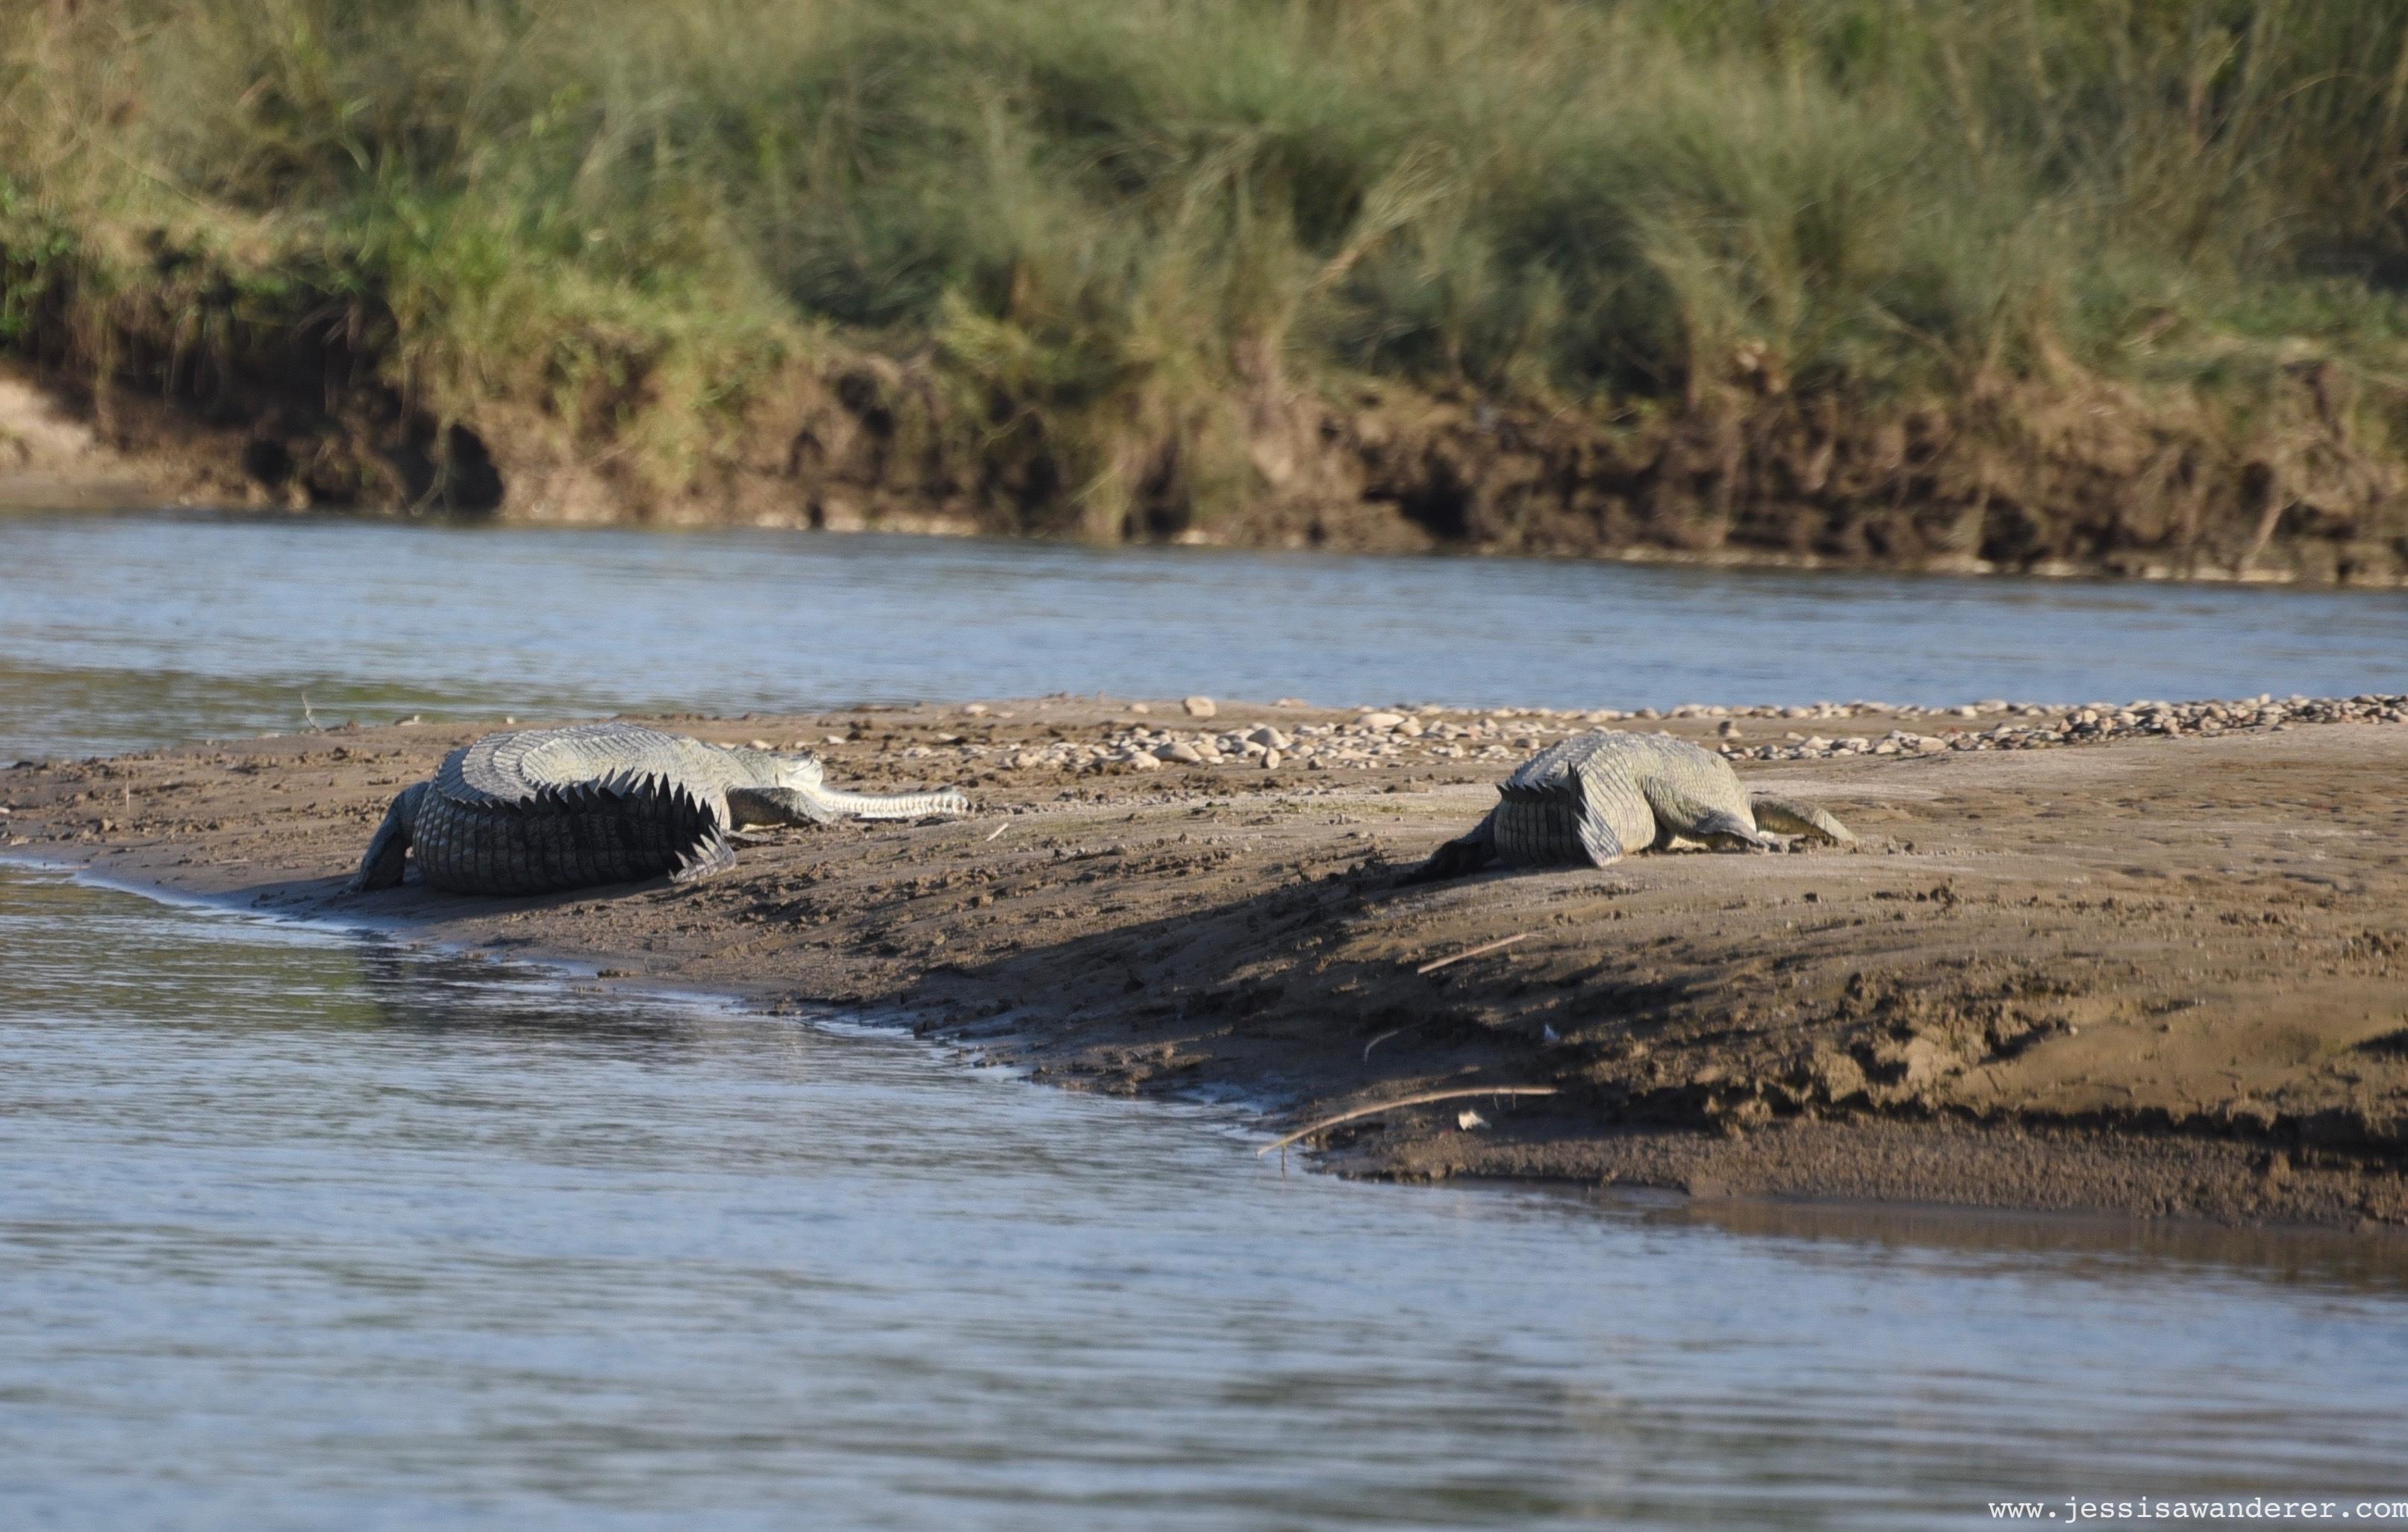 Crocs on the move